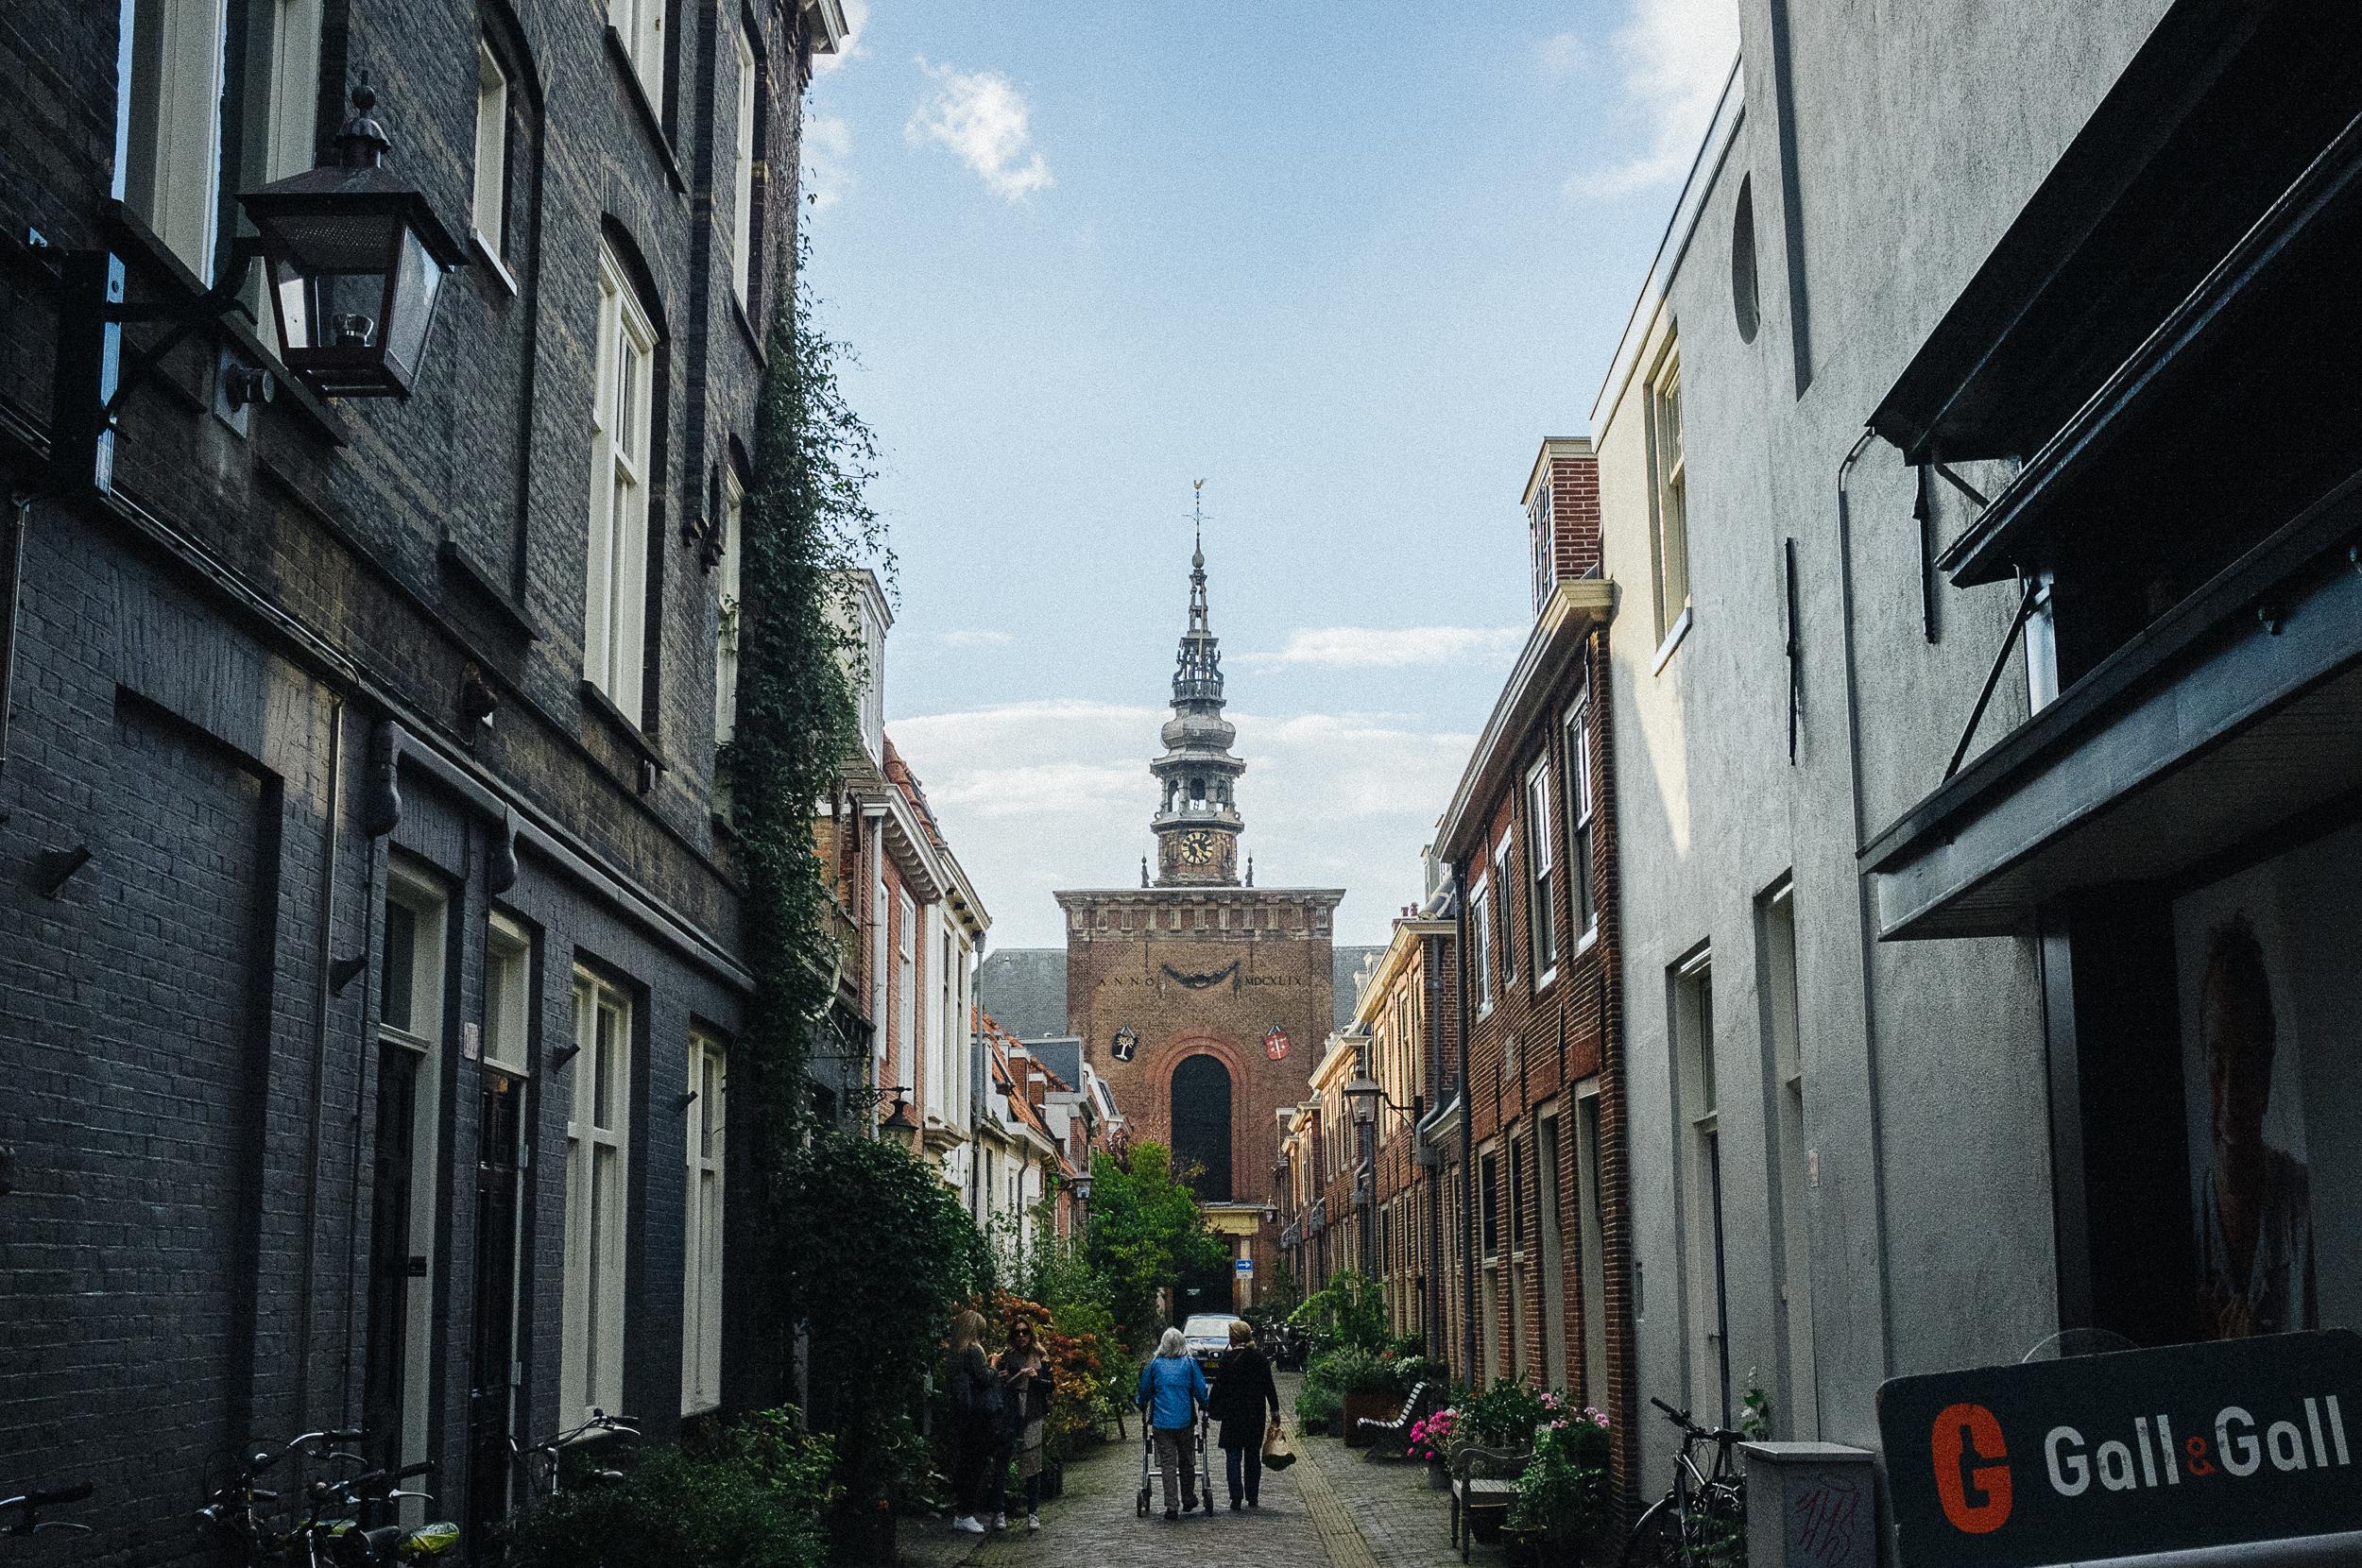 Alley view of Haarlem's Nieuwe Kerk.Photo taken with Fuji X100S, edited with VSCO.